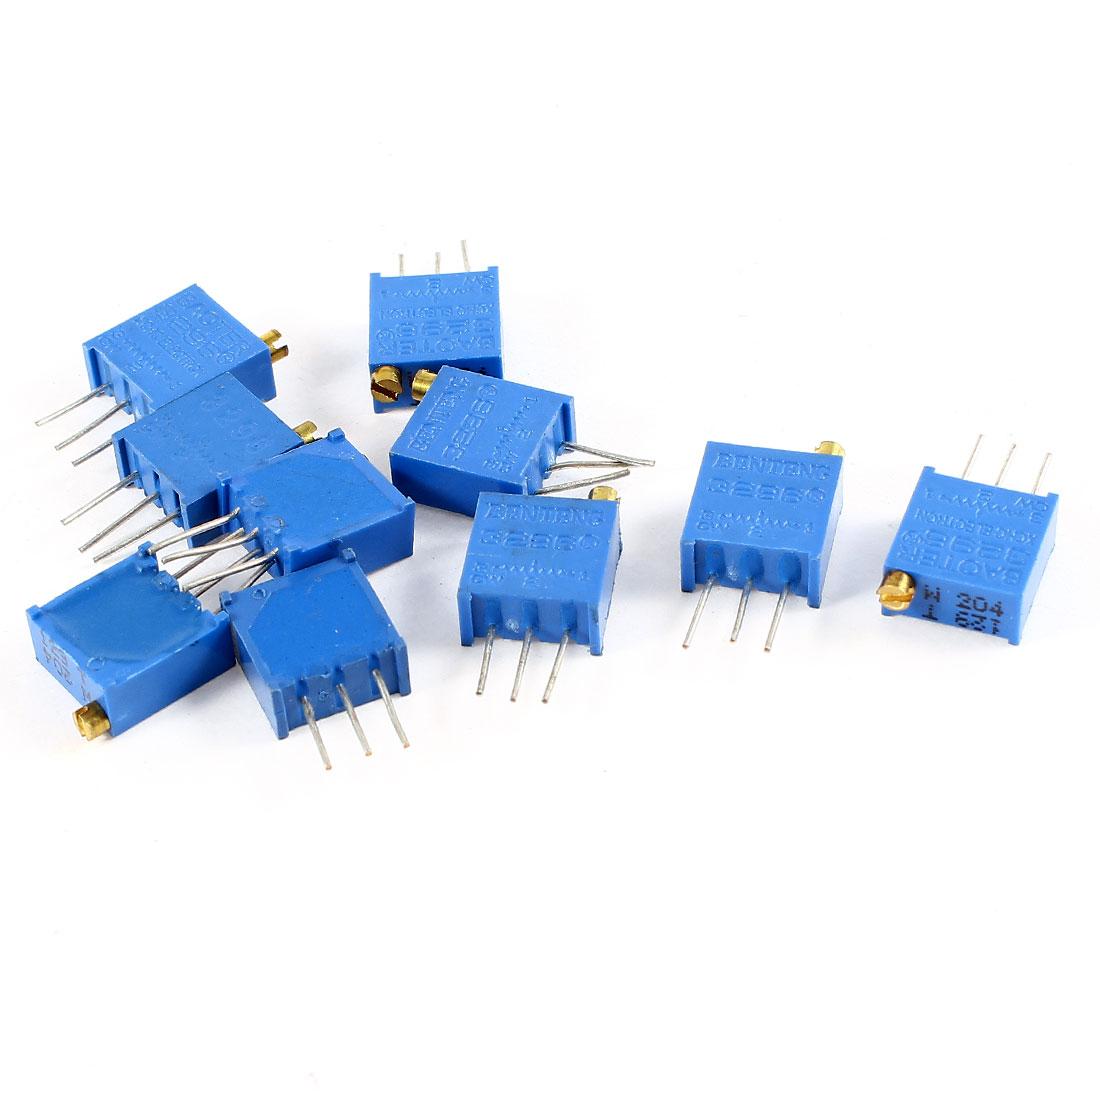 10Pcs 3296W-204 200K ohm 3 Pins High Precision Adjustable Resistor Trim Pot Potentiometer Trimmer